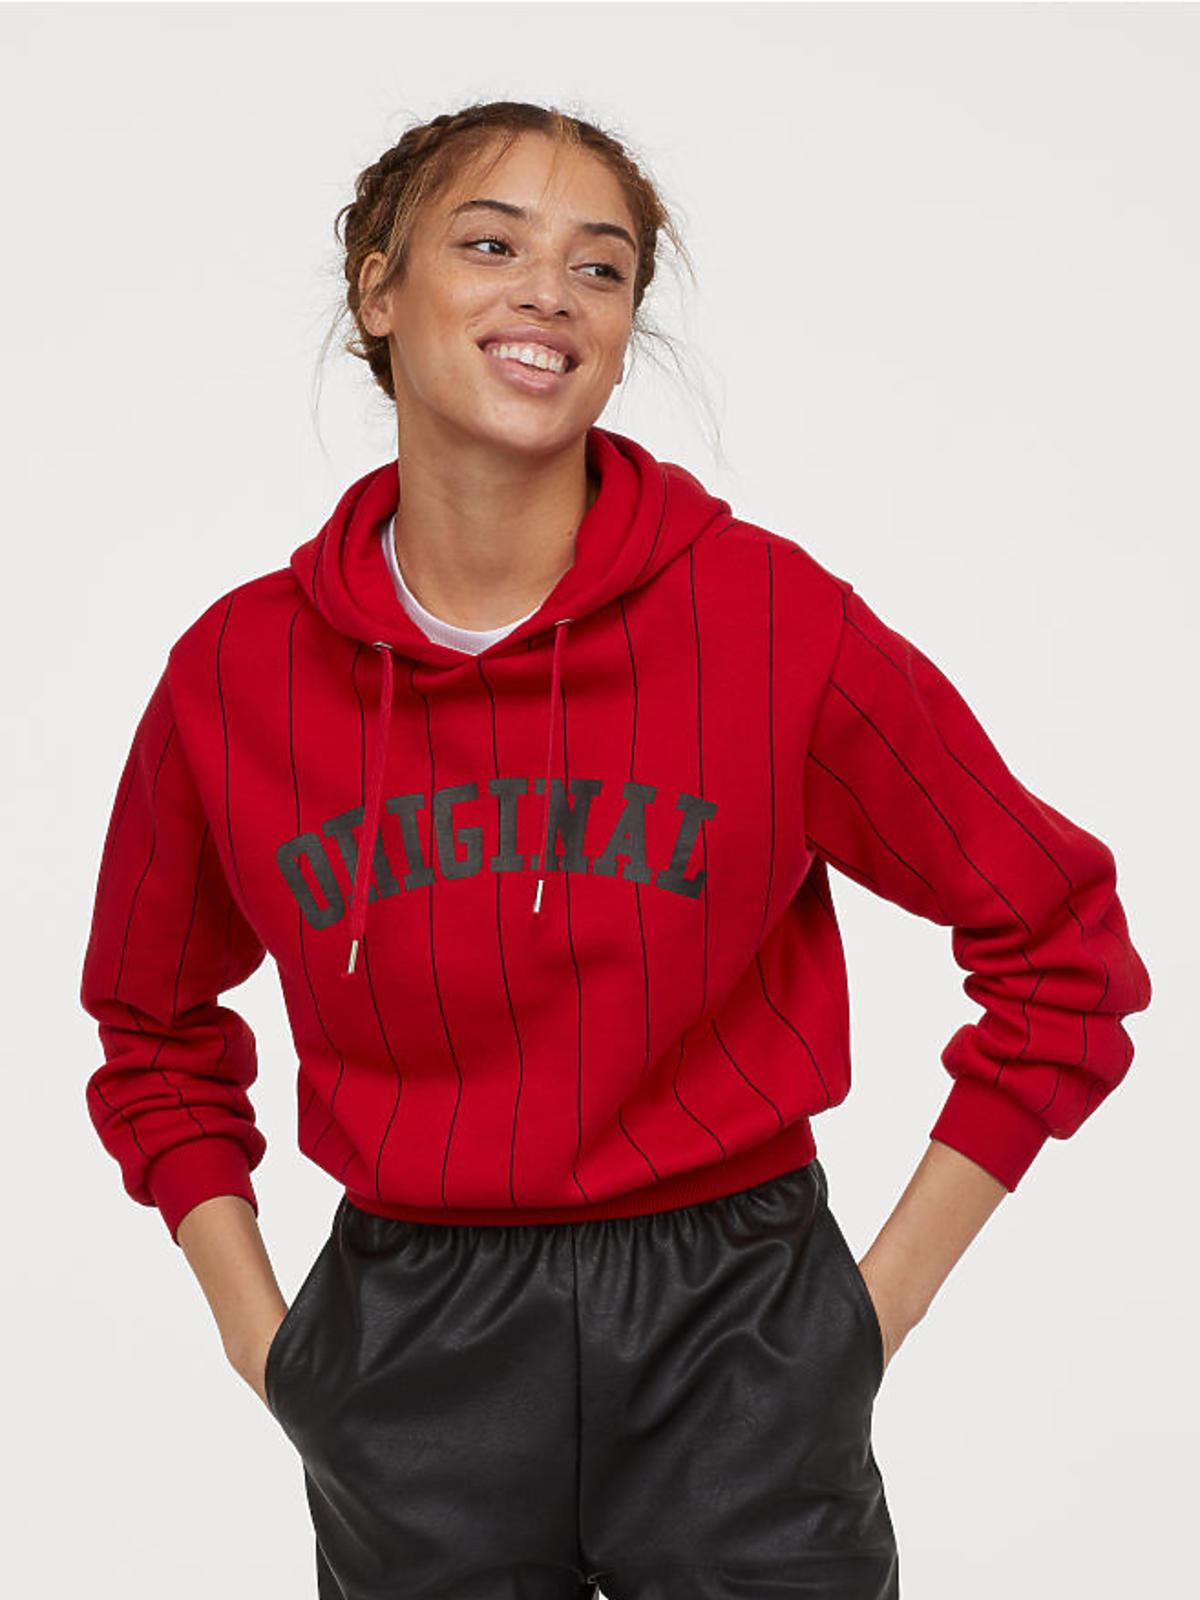 Bluza H&M cena 79 zł